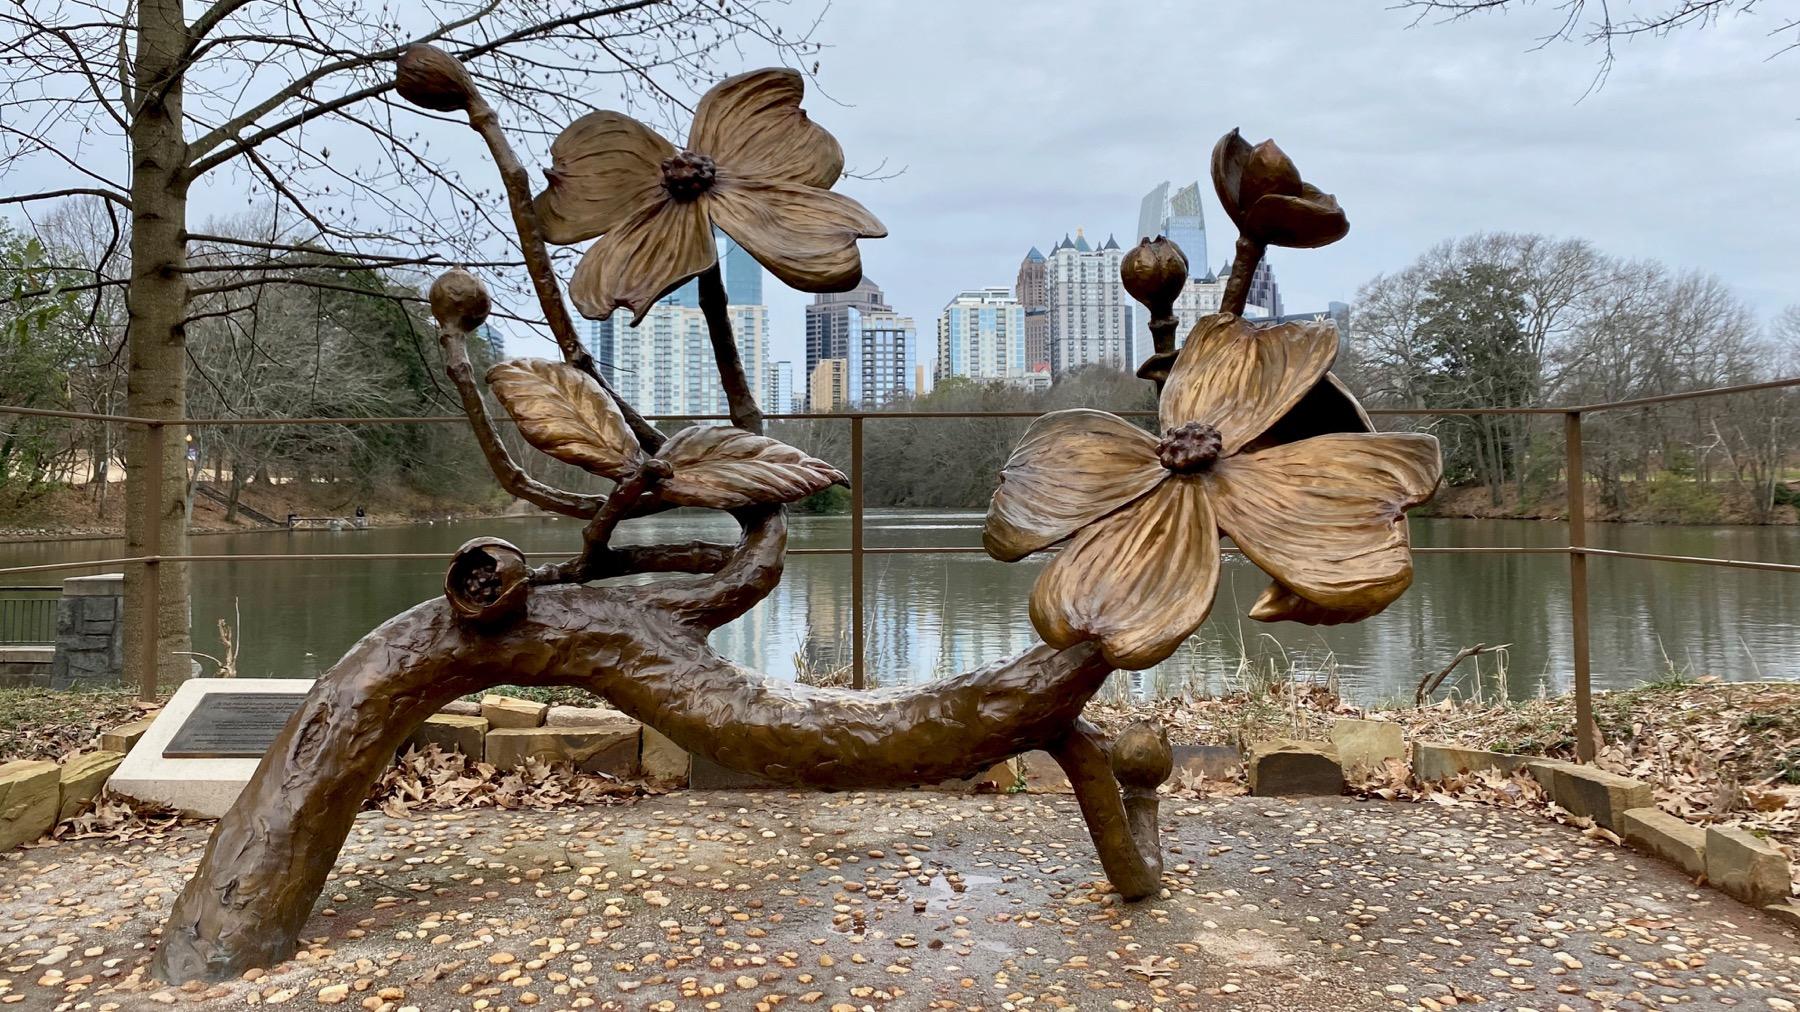 Dogwood statue